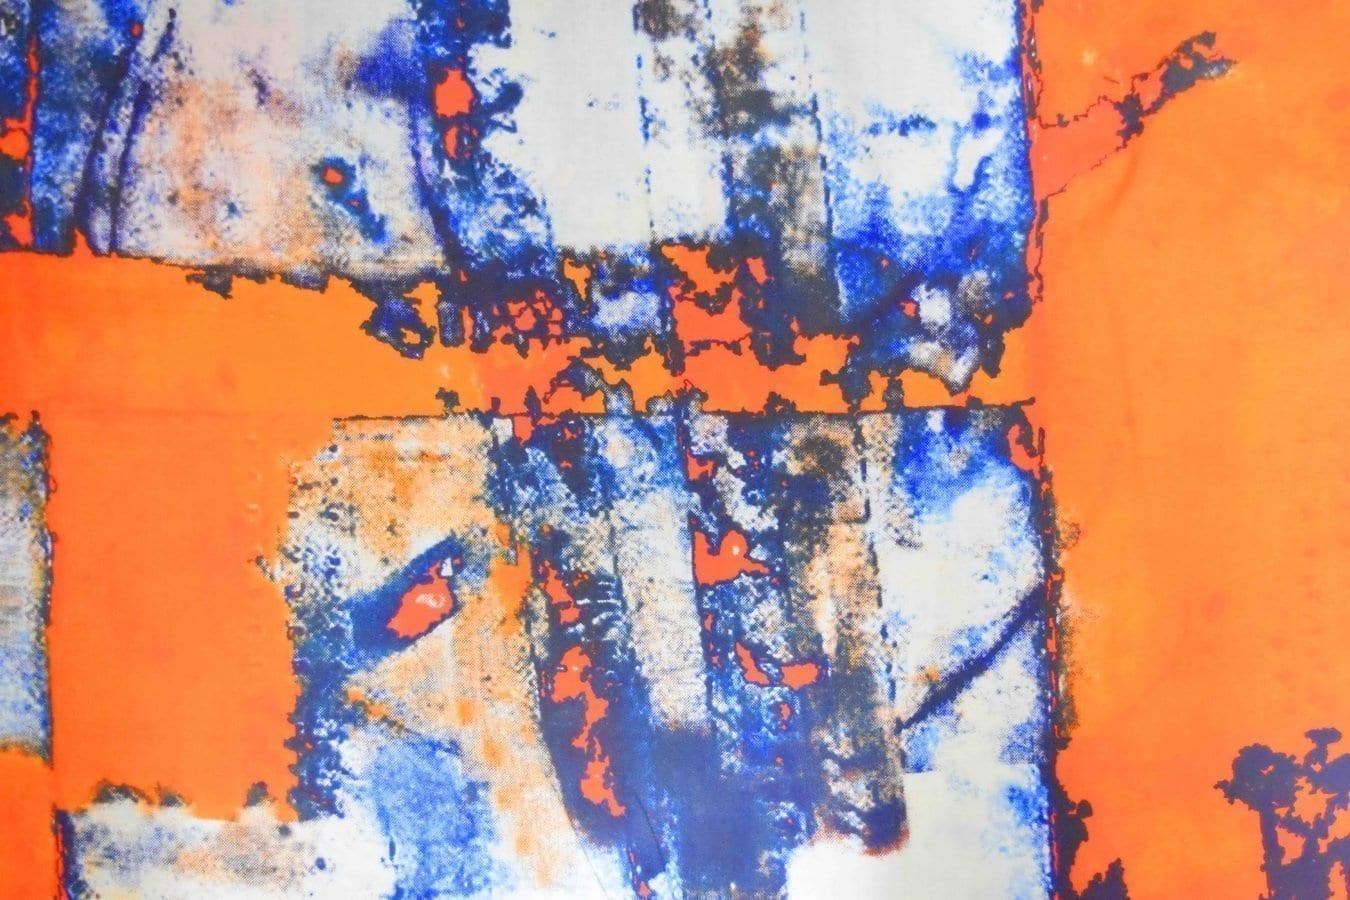 Orange COTTON PRINTED FABRIC for Multipurpose use PC362 2